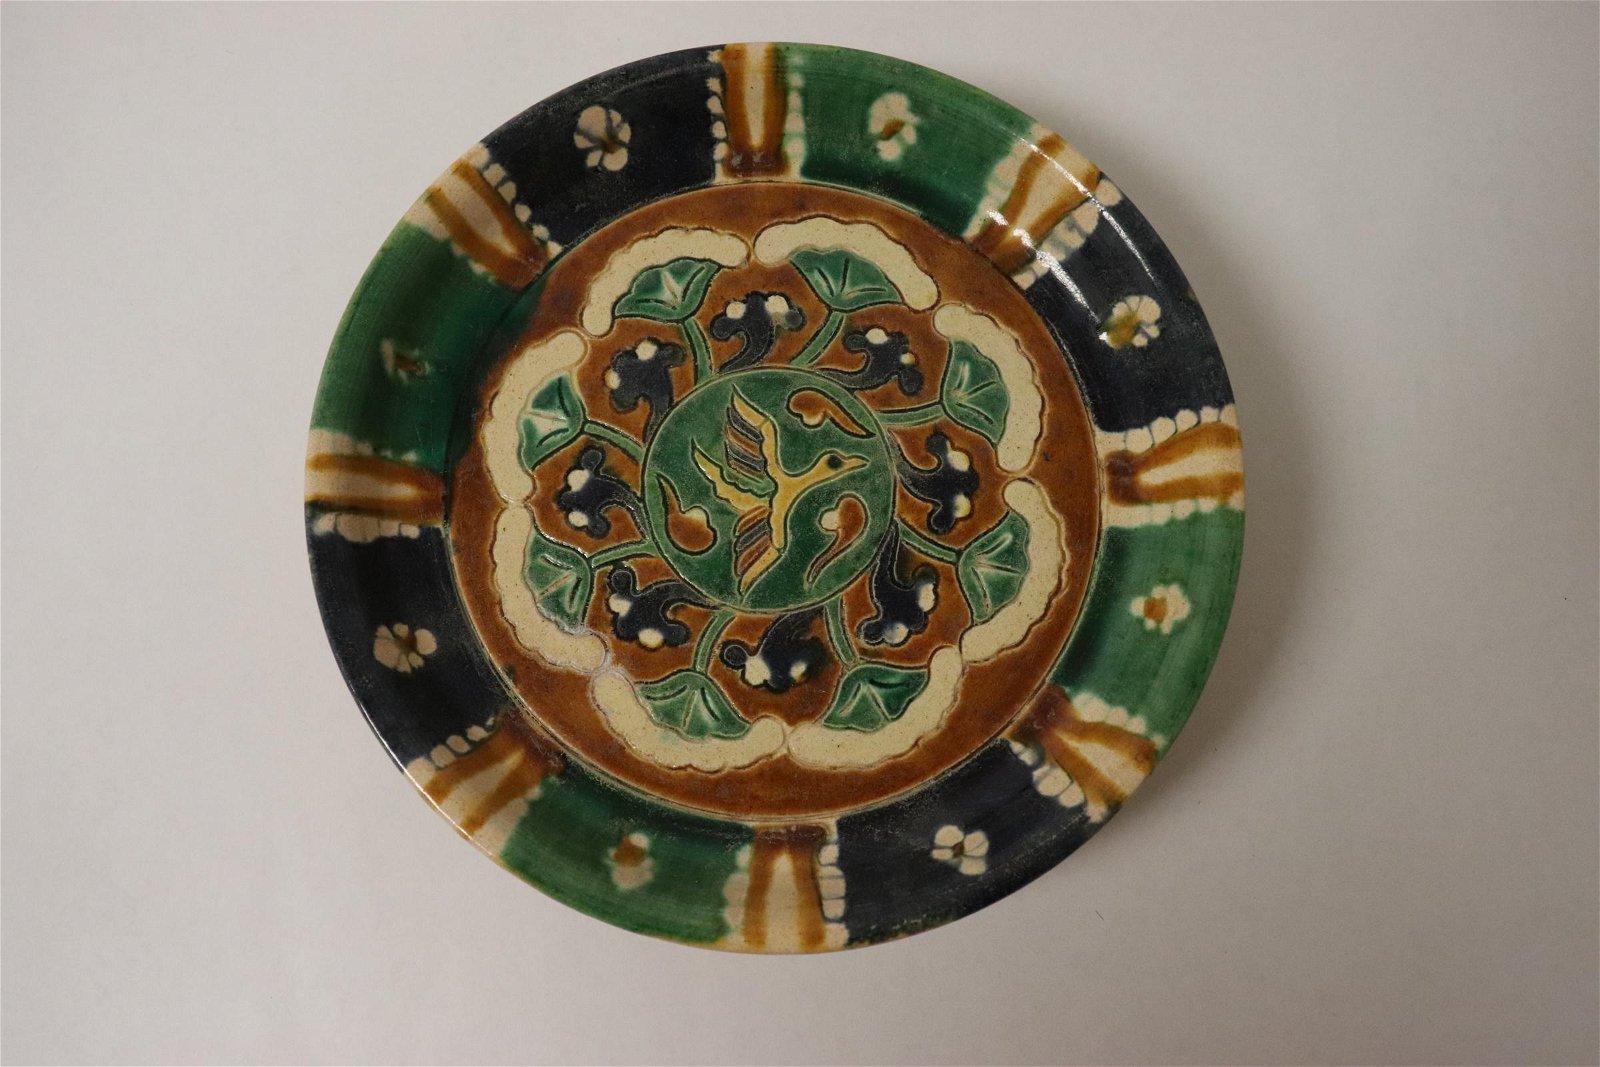 Unusual sancai style tripod plate